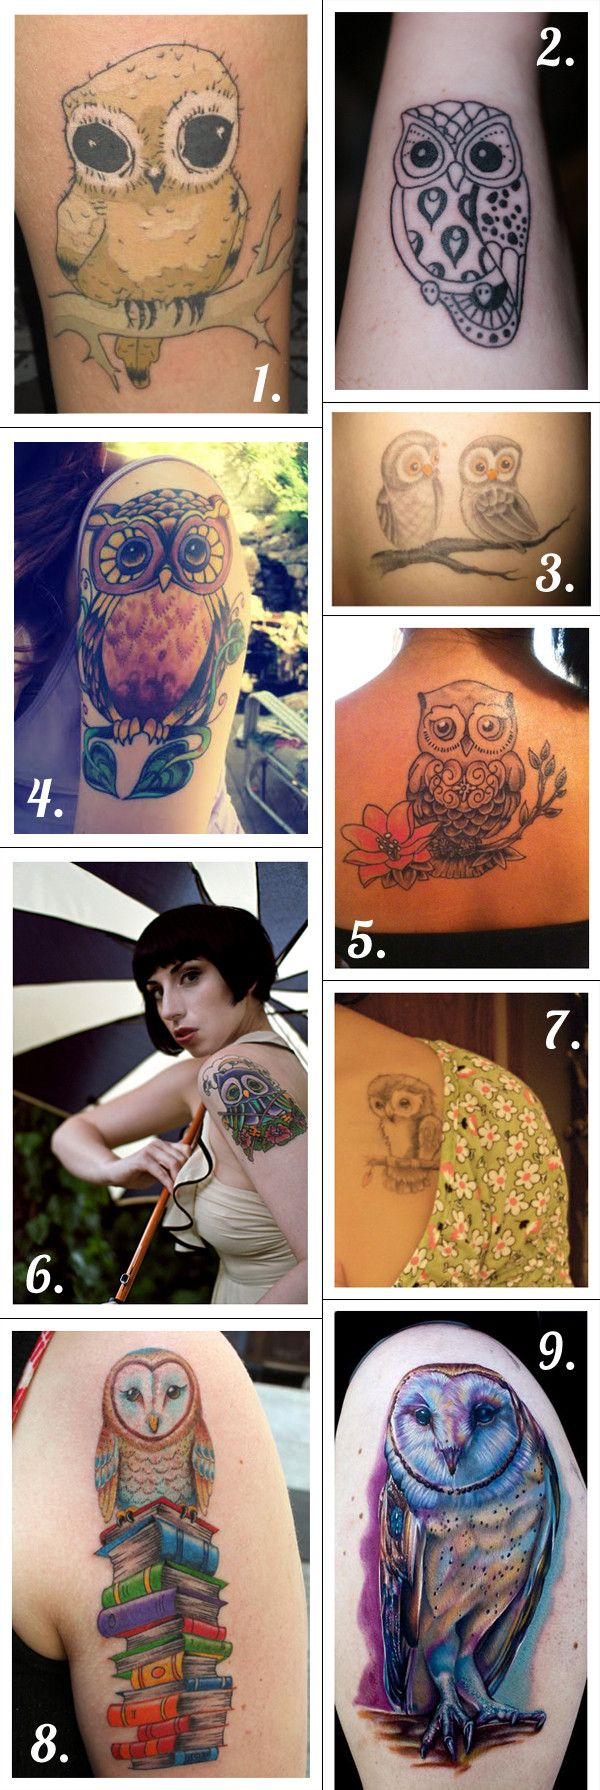 Owl tattoos the bald black eyed chick love tattos for Tattoo bald spot